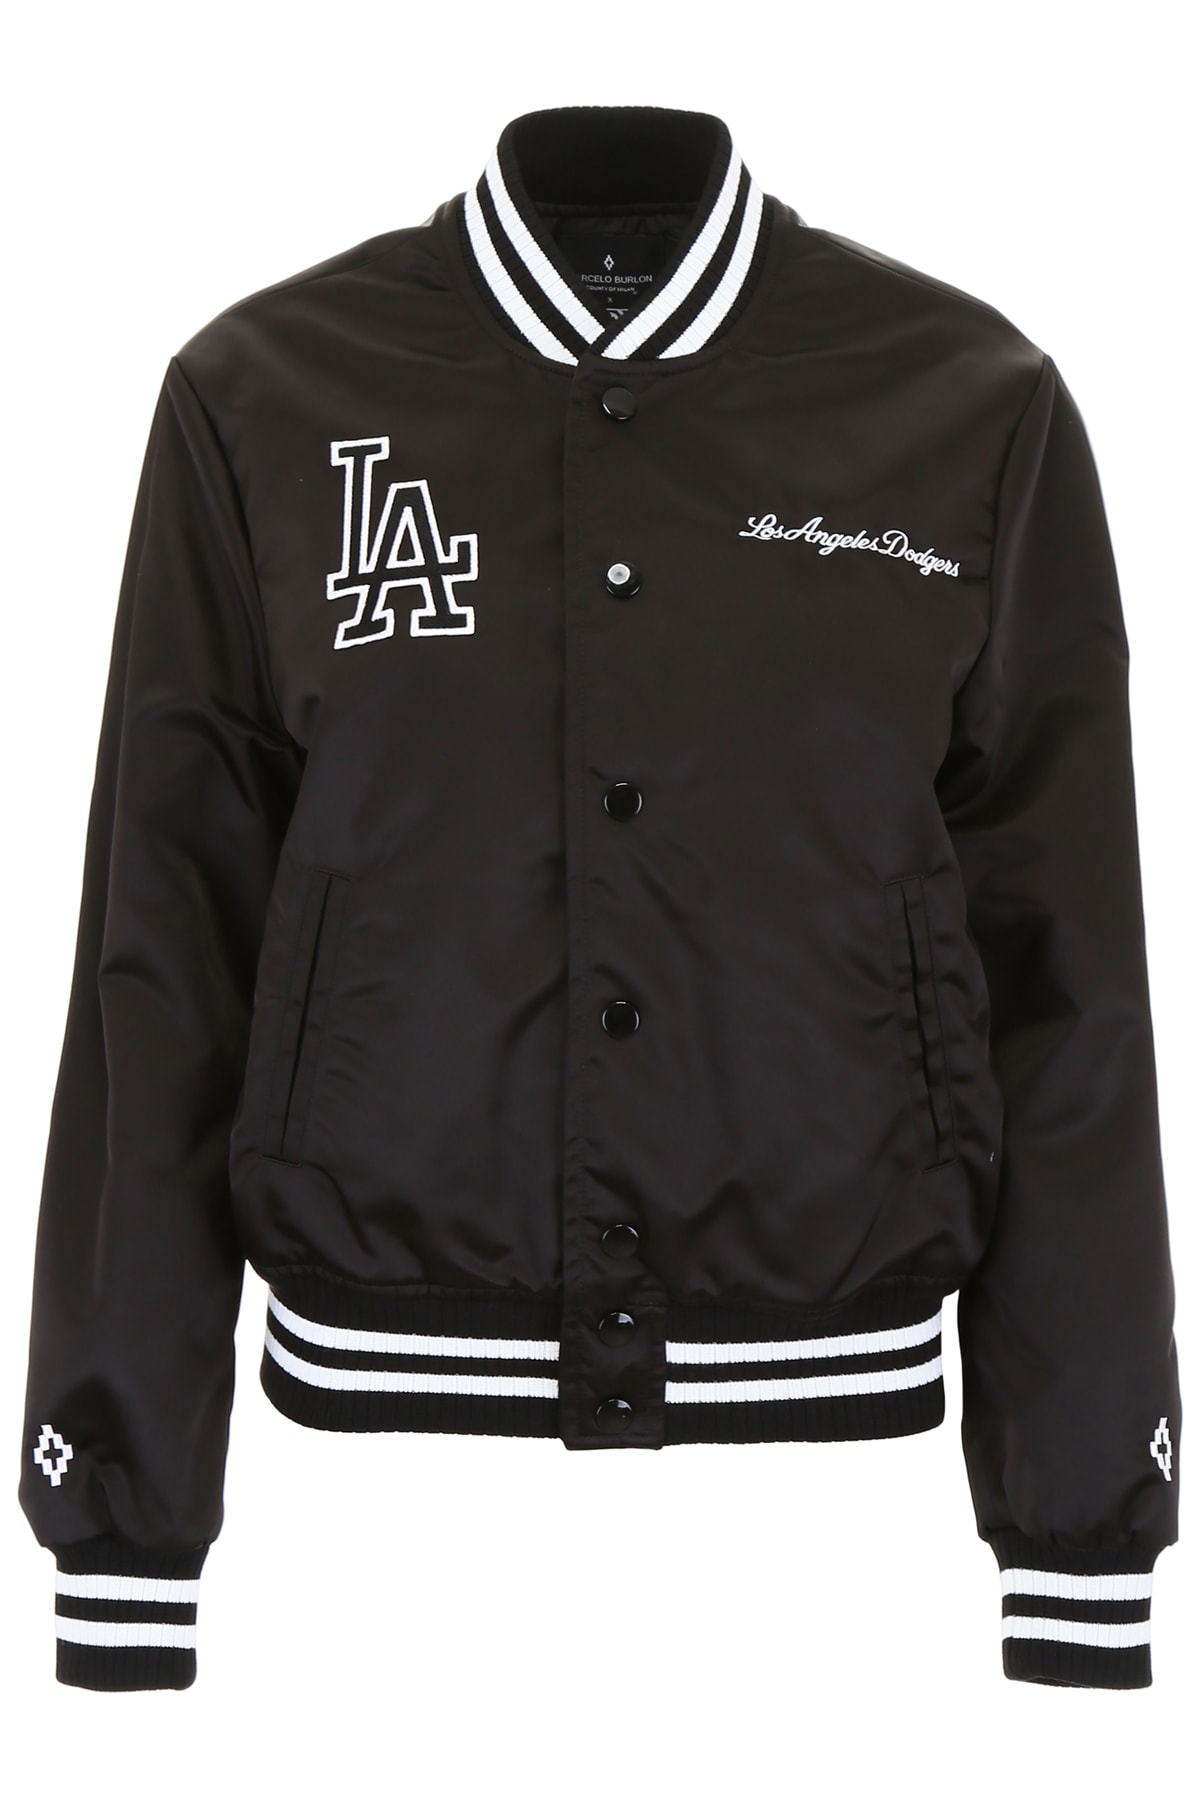 Marcelo Burlon La Dodgers Bomber Jacket